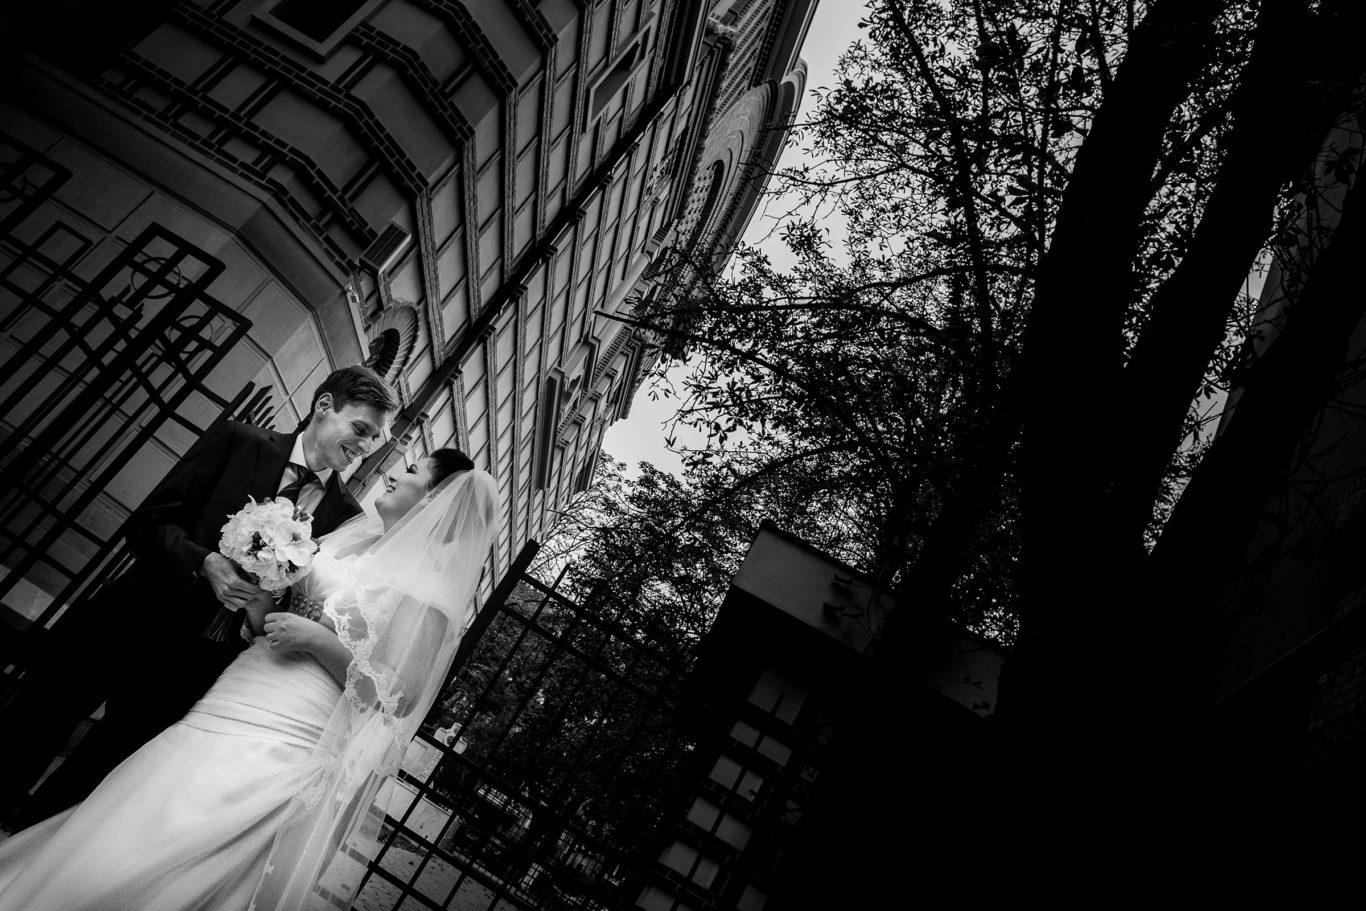 0321-Fotografie-nunta-Roxana-Costin-fotograf-Ciprian-Dumitrescu-DC1X0811